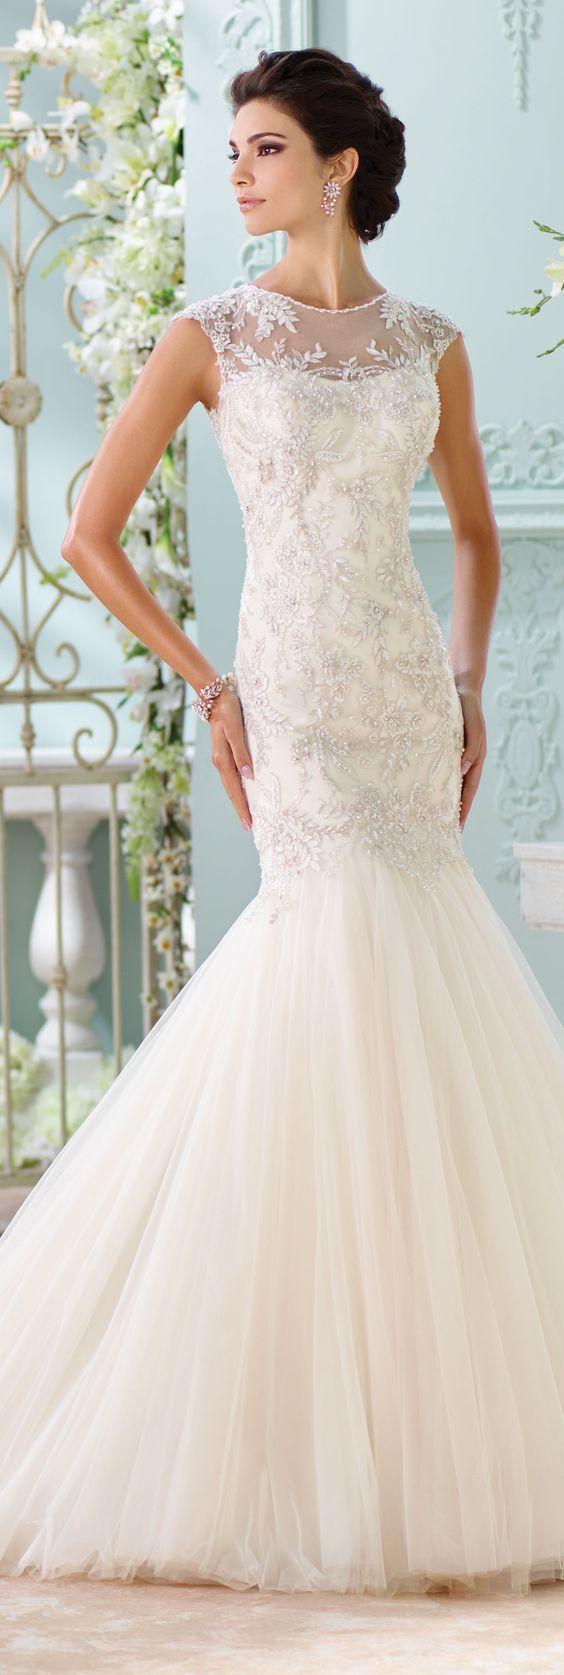 Mariage - Lace Open Back Wedding Dress